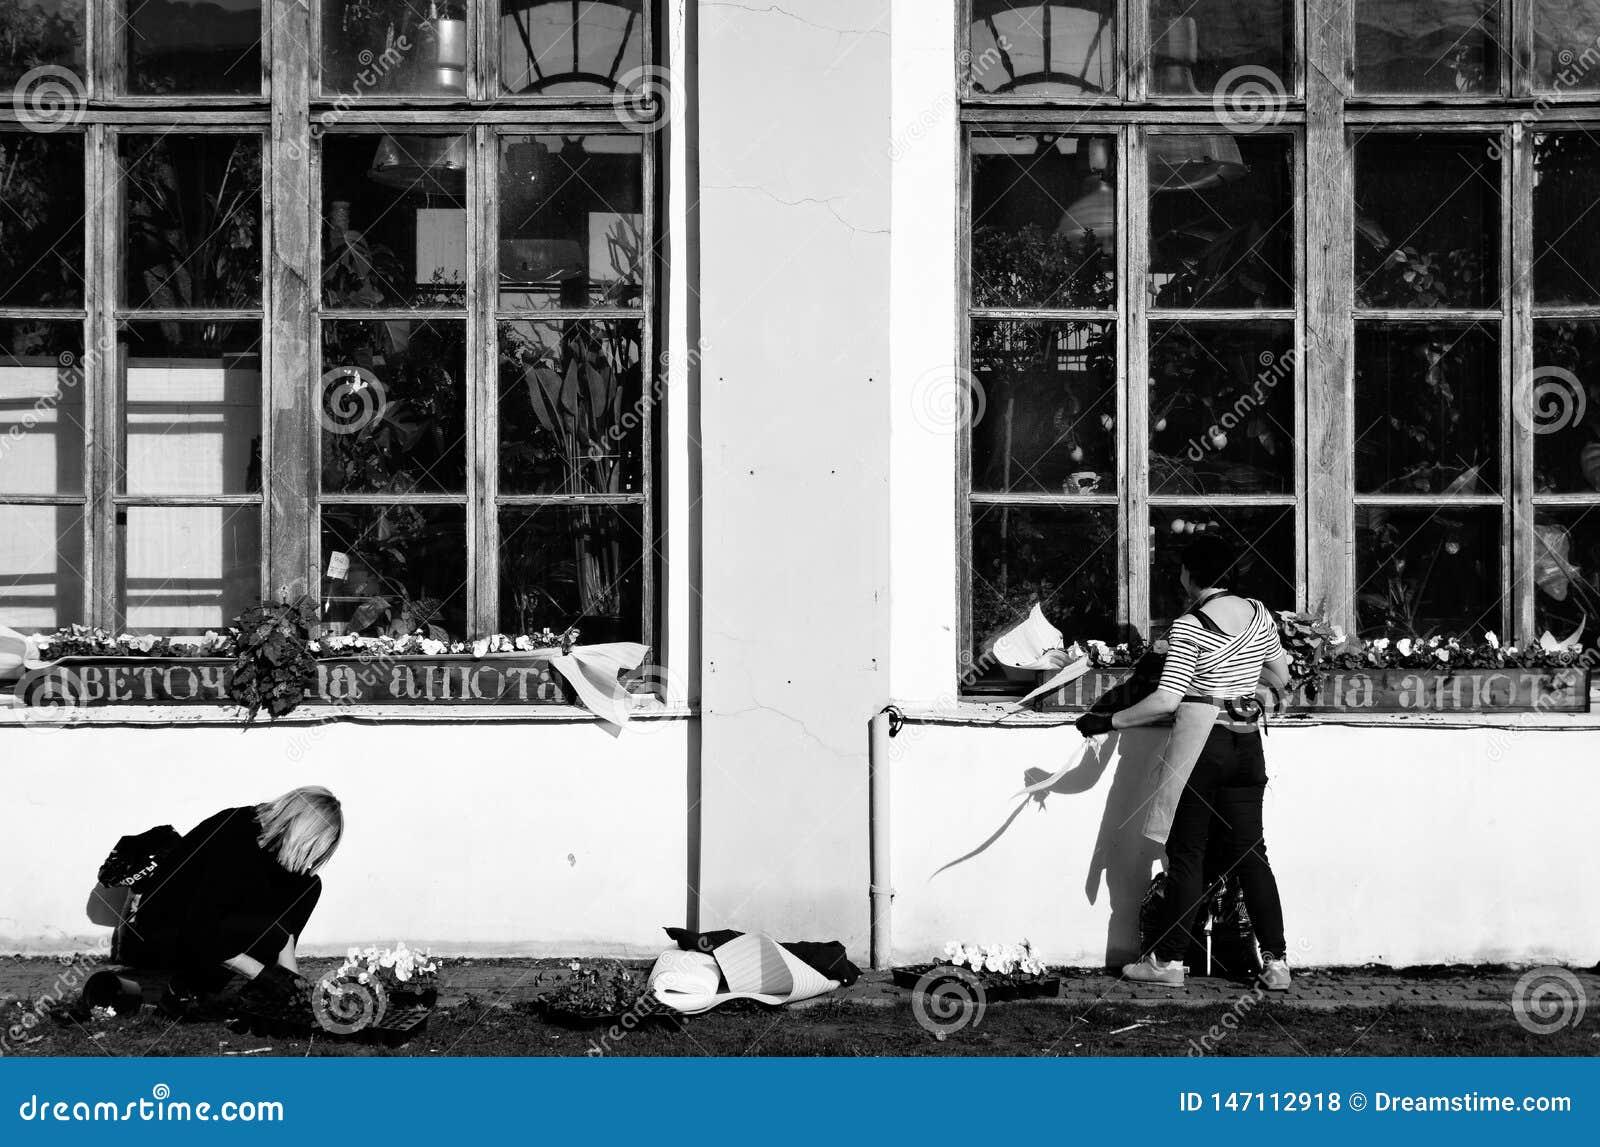 Donne sul lavoro, San Pietroburgo